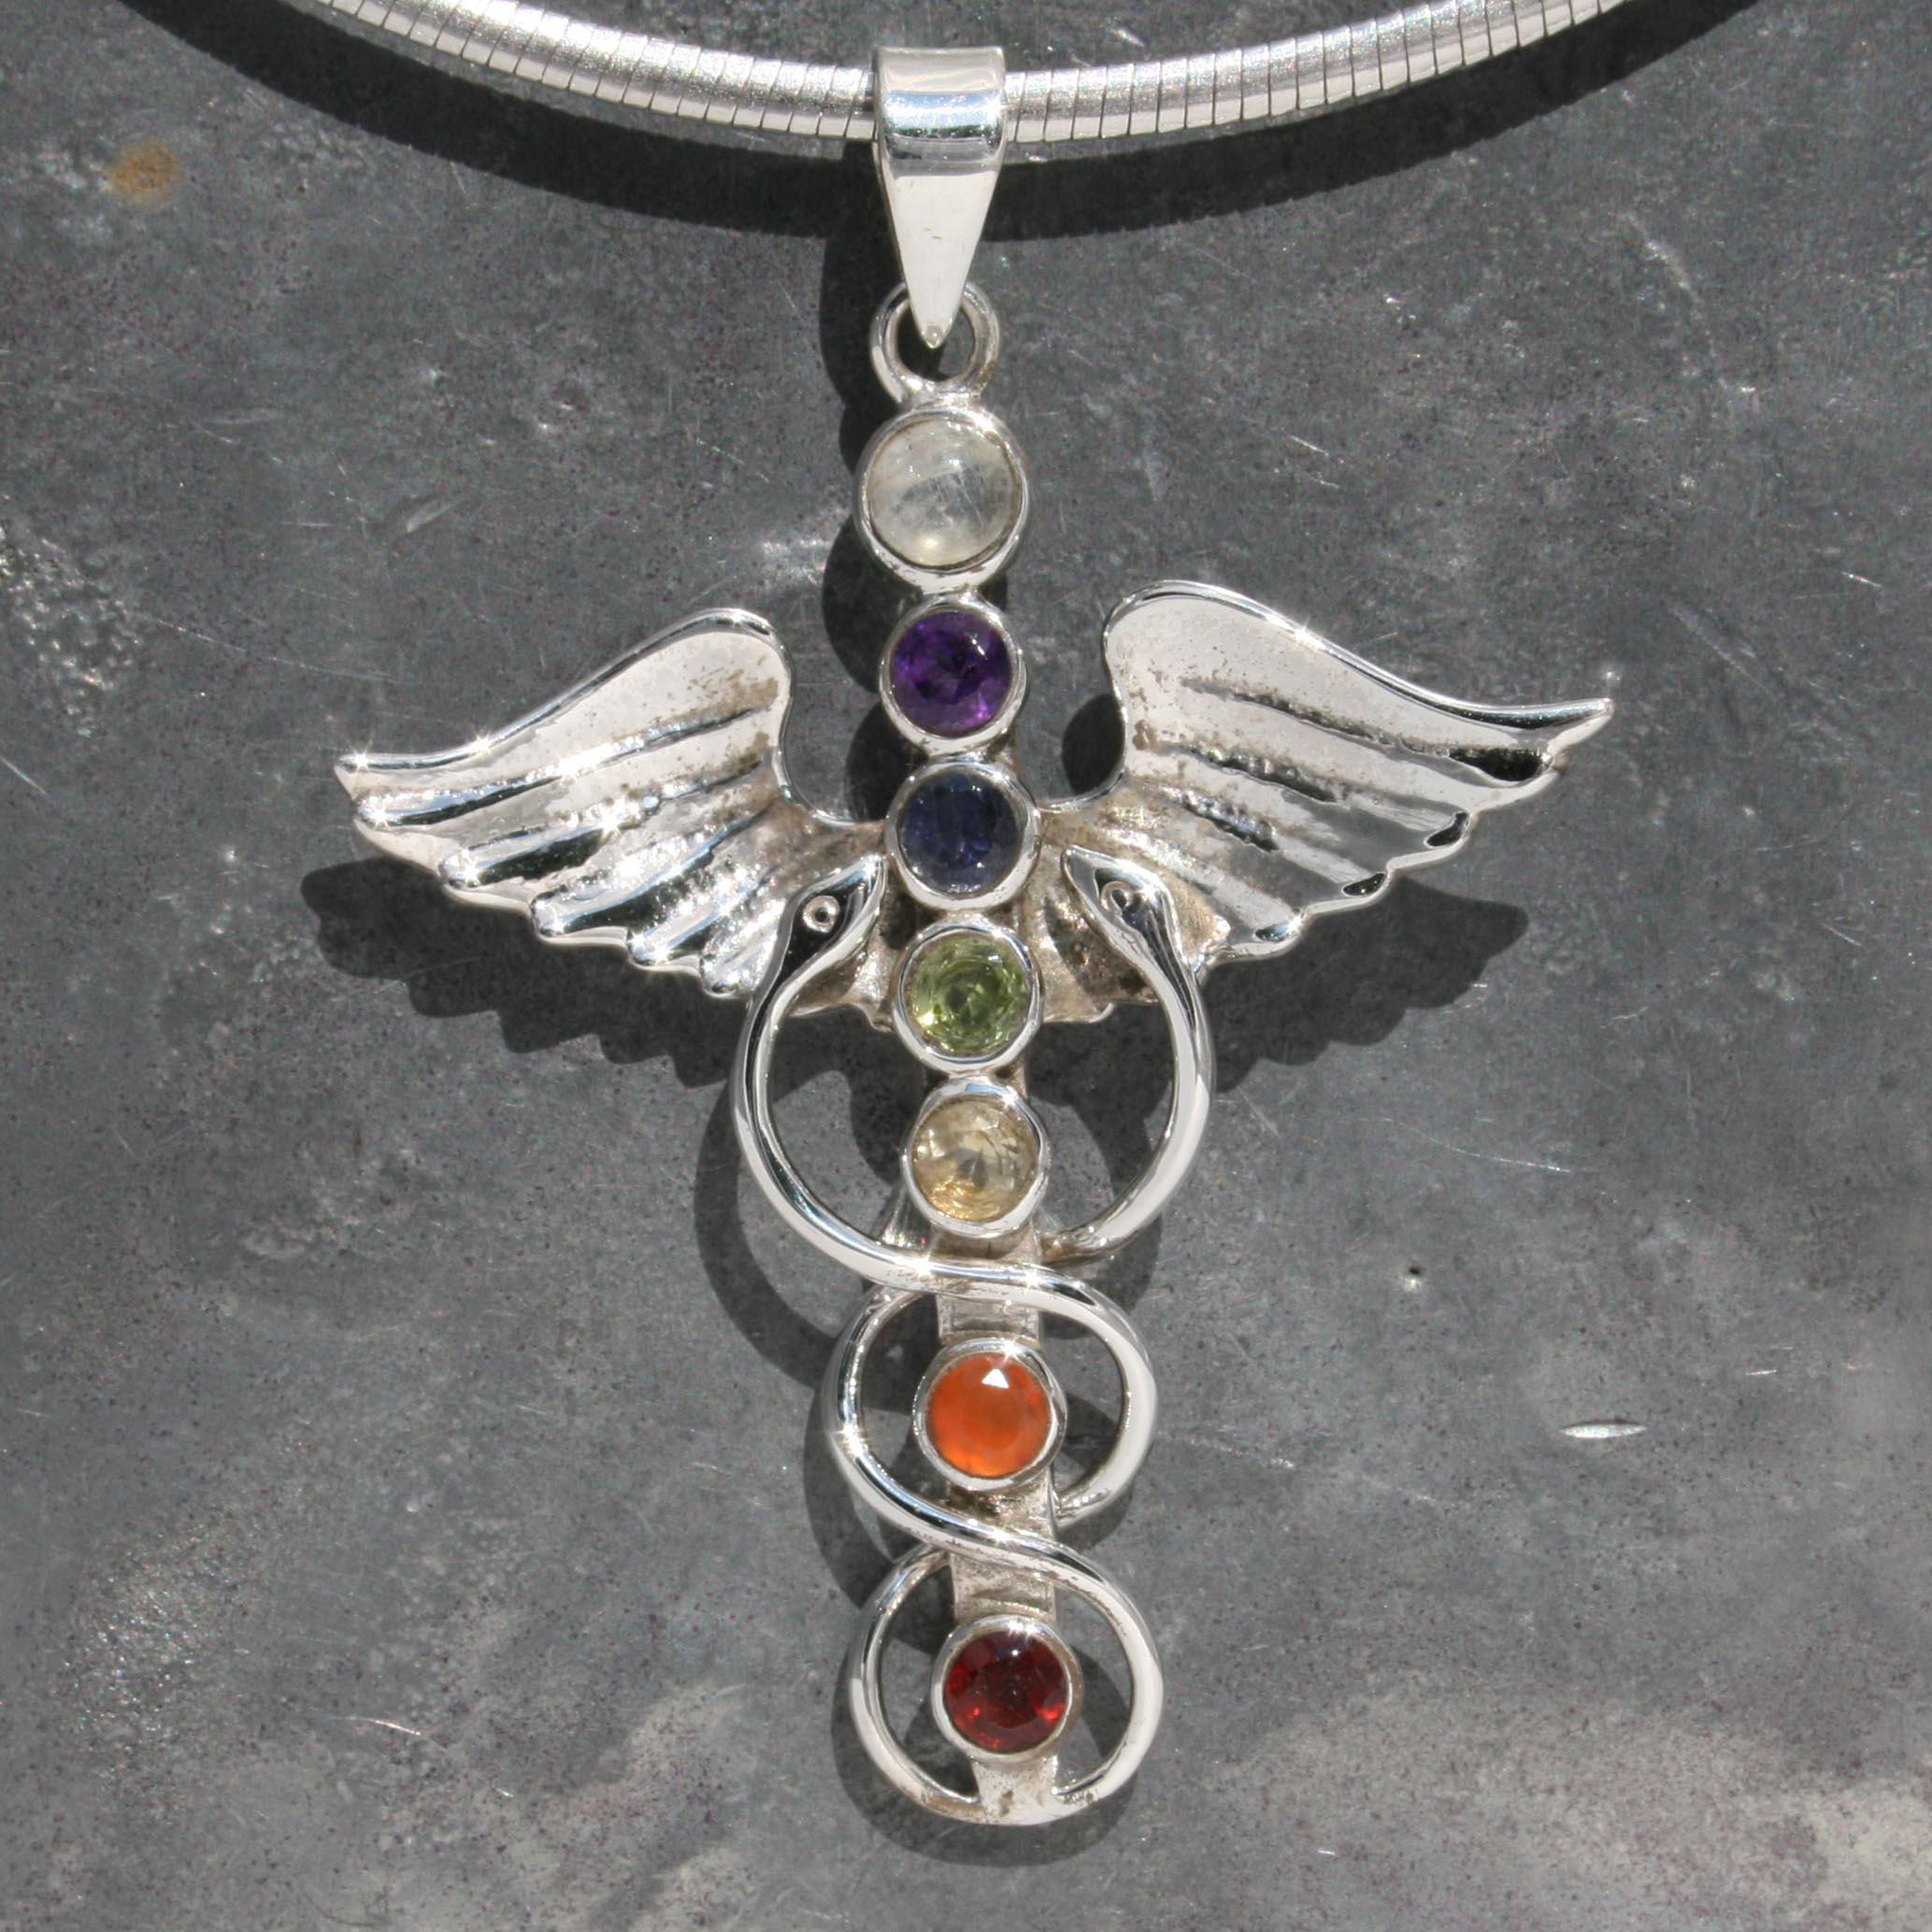 Chakra caduceus pendant lumina jewellery 7 chakra caduceus pendant mozeypictures Image collections